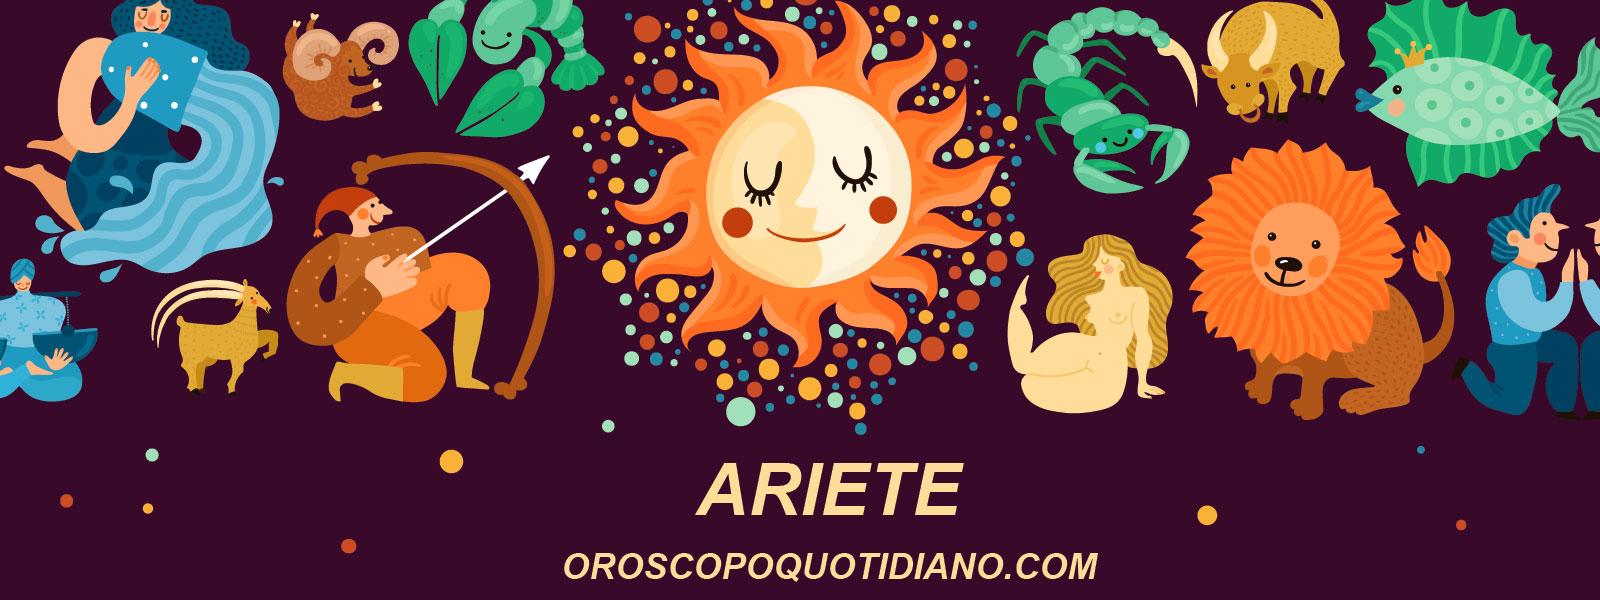 http://oroscopoquotidiano.com/wp-content/uploads/2020/02/Ariete-OroscopoQuotidiano.jpg